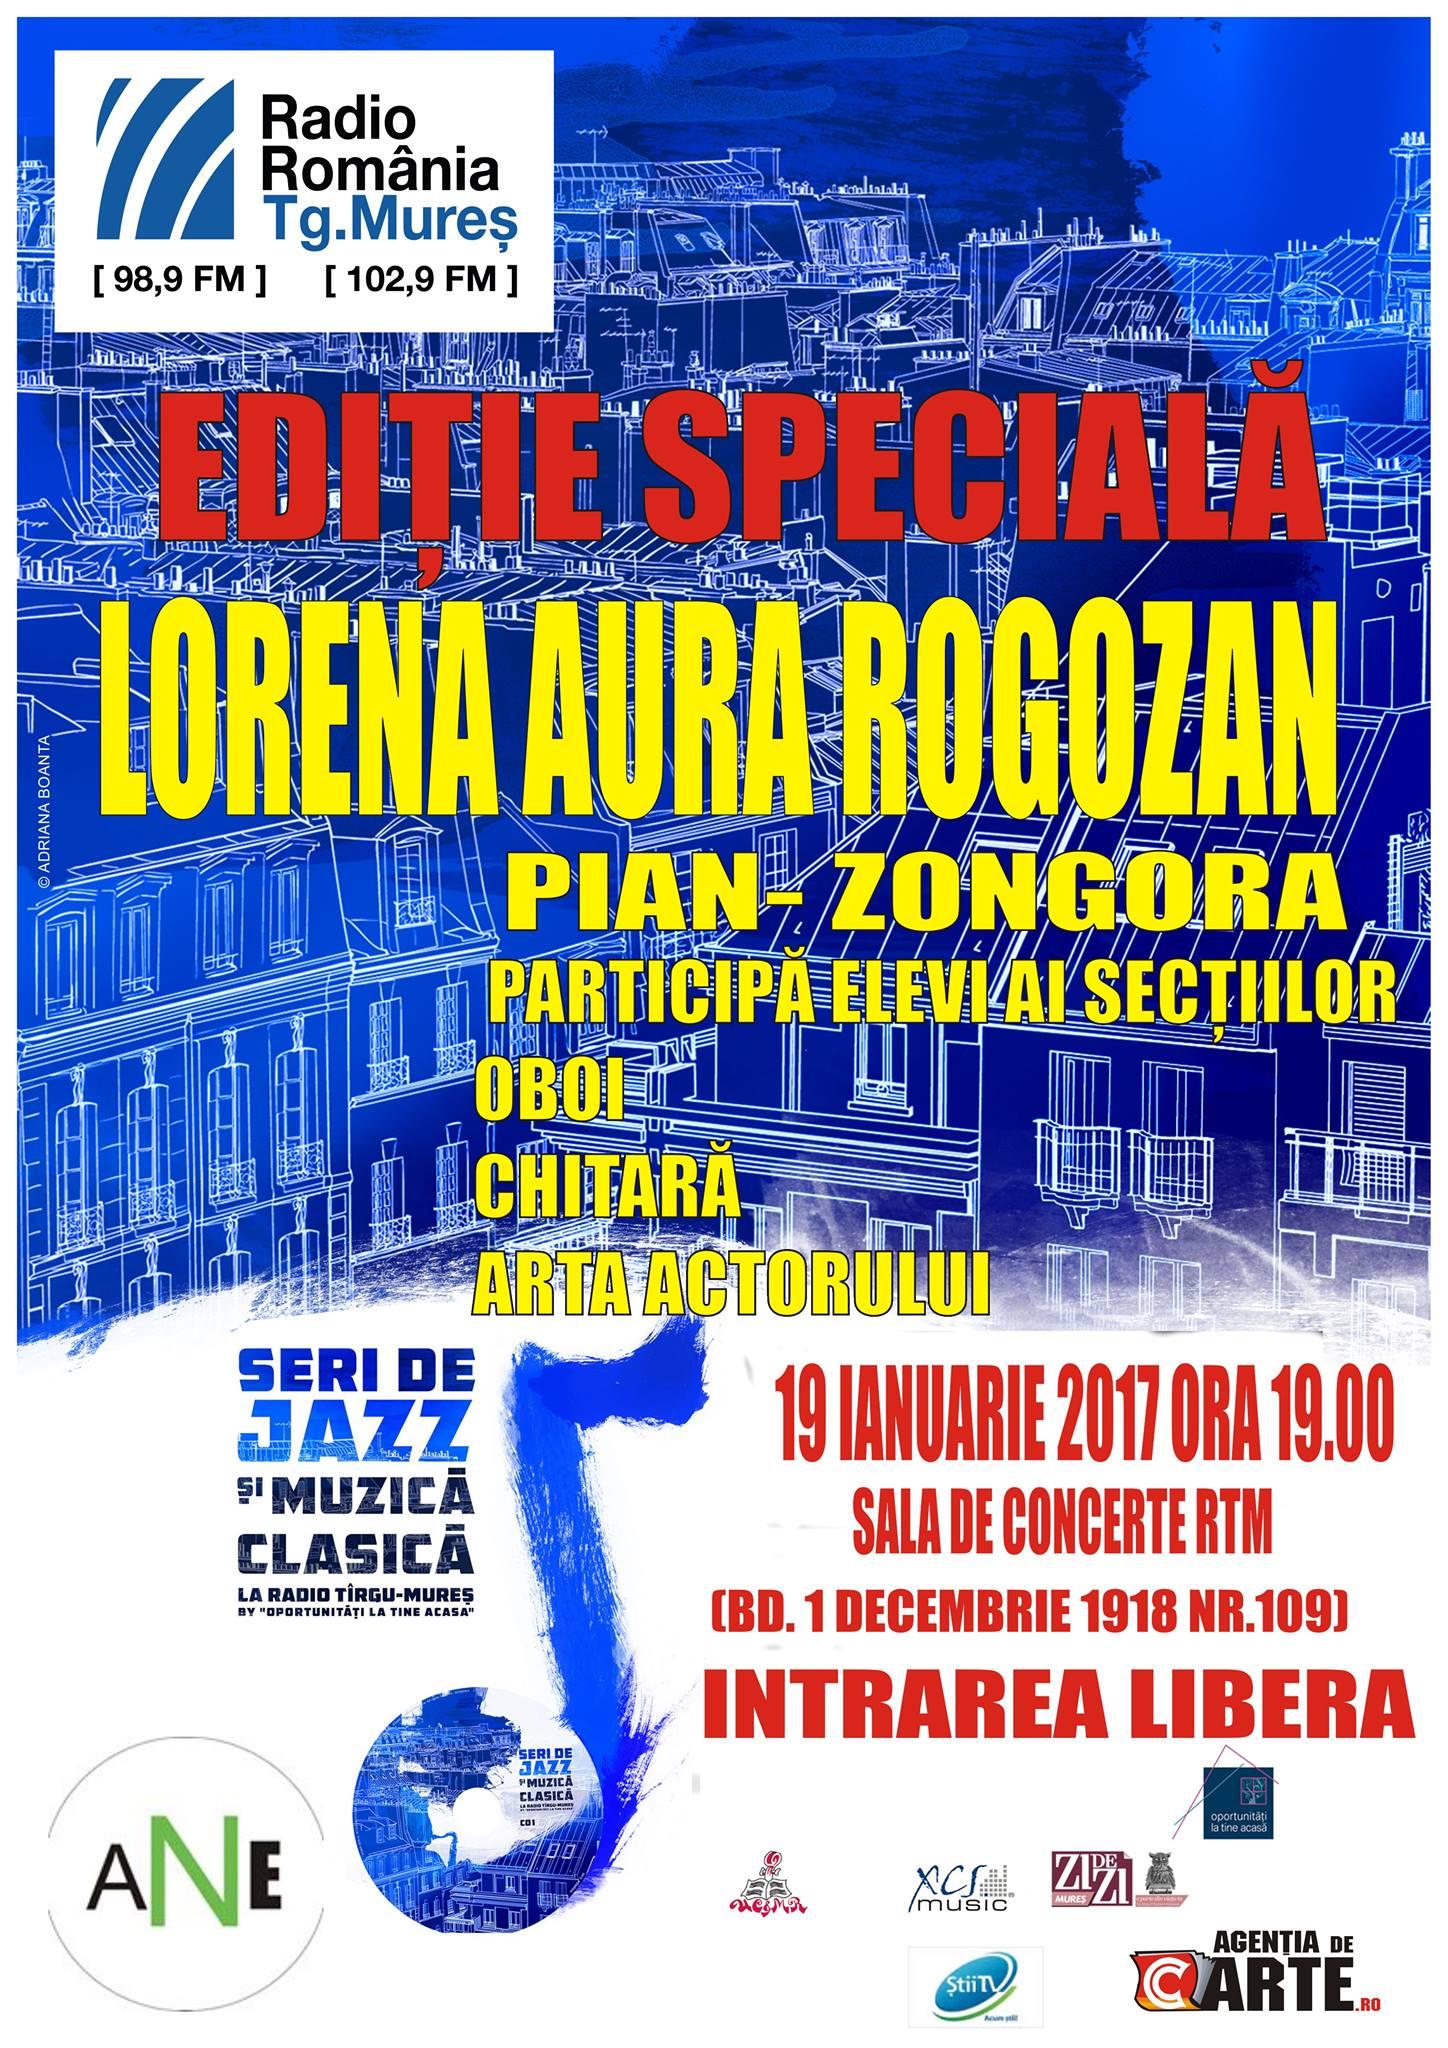 event ianuarie 2017